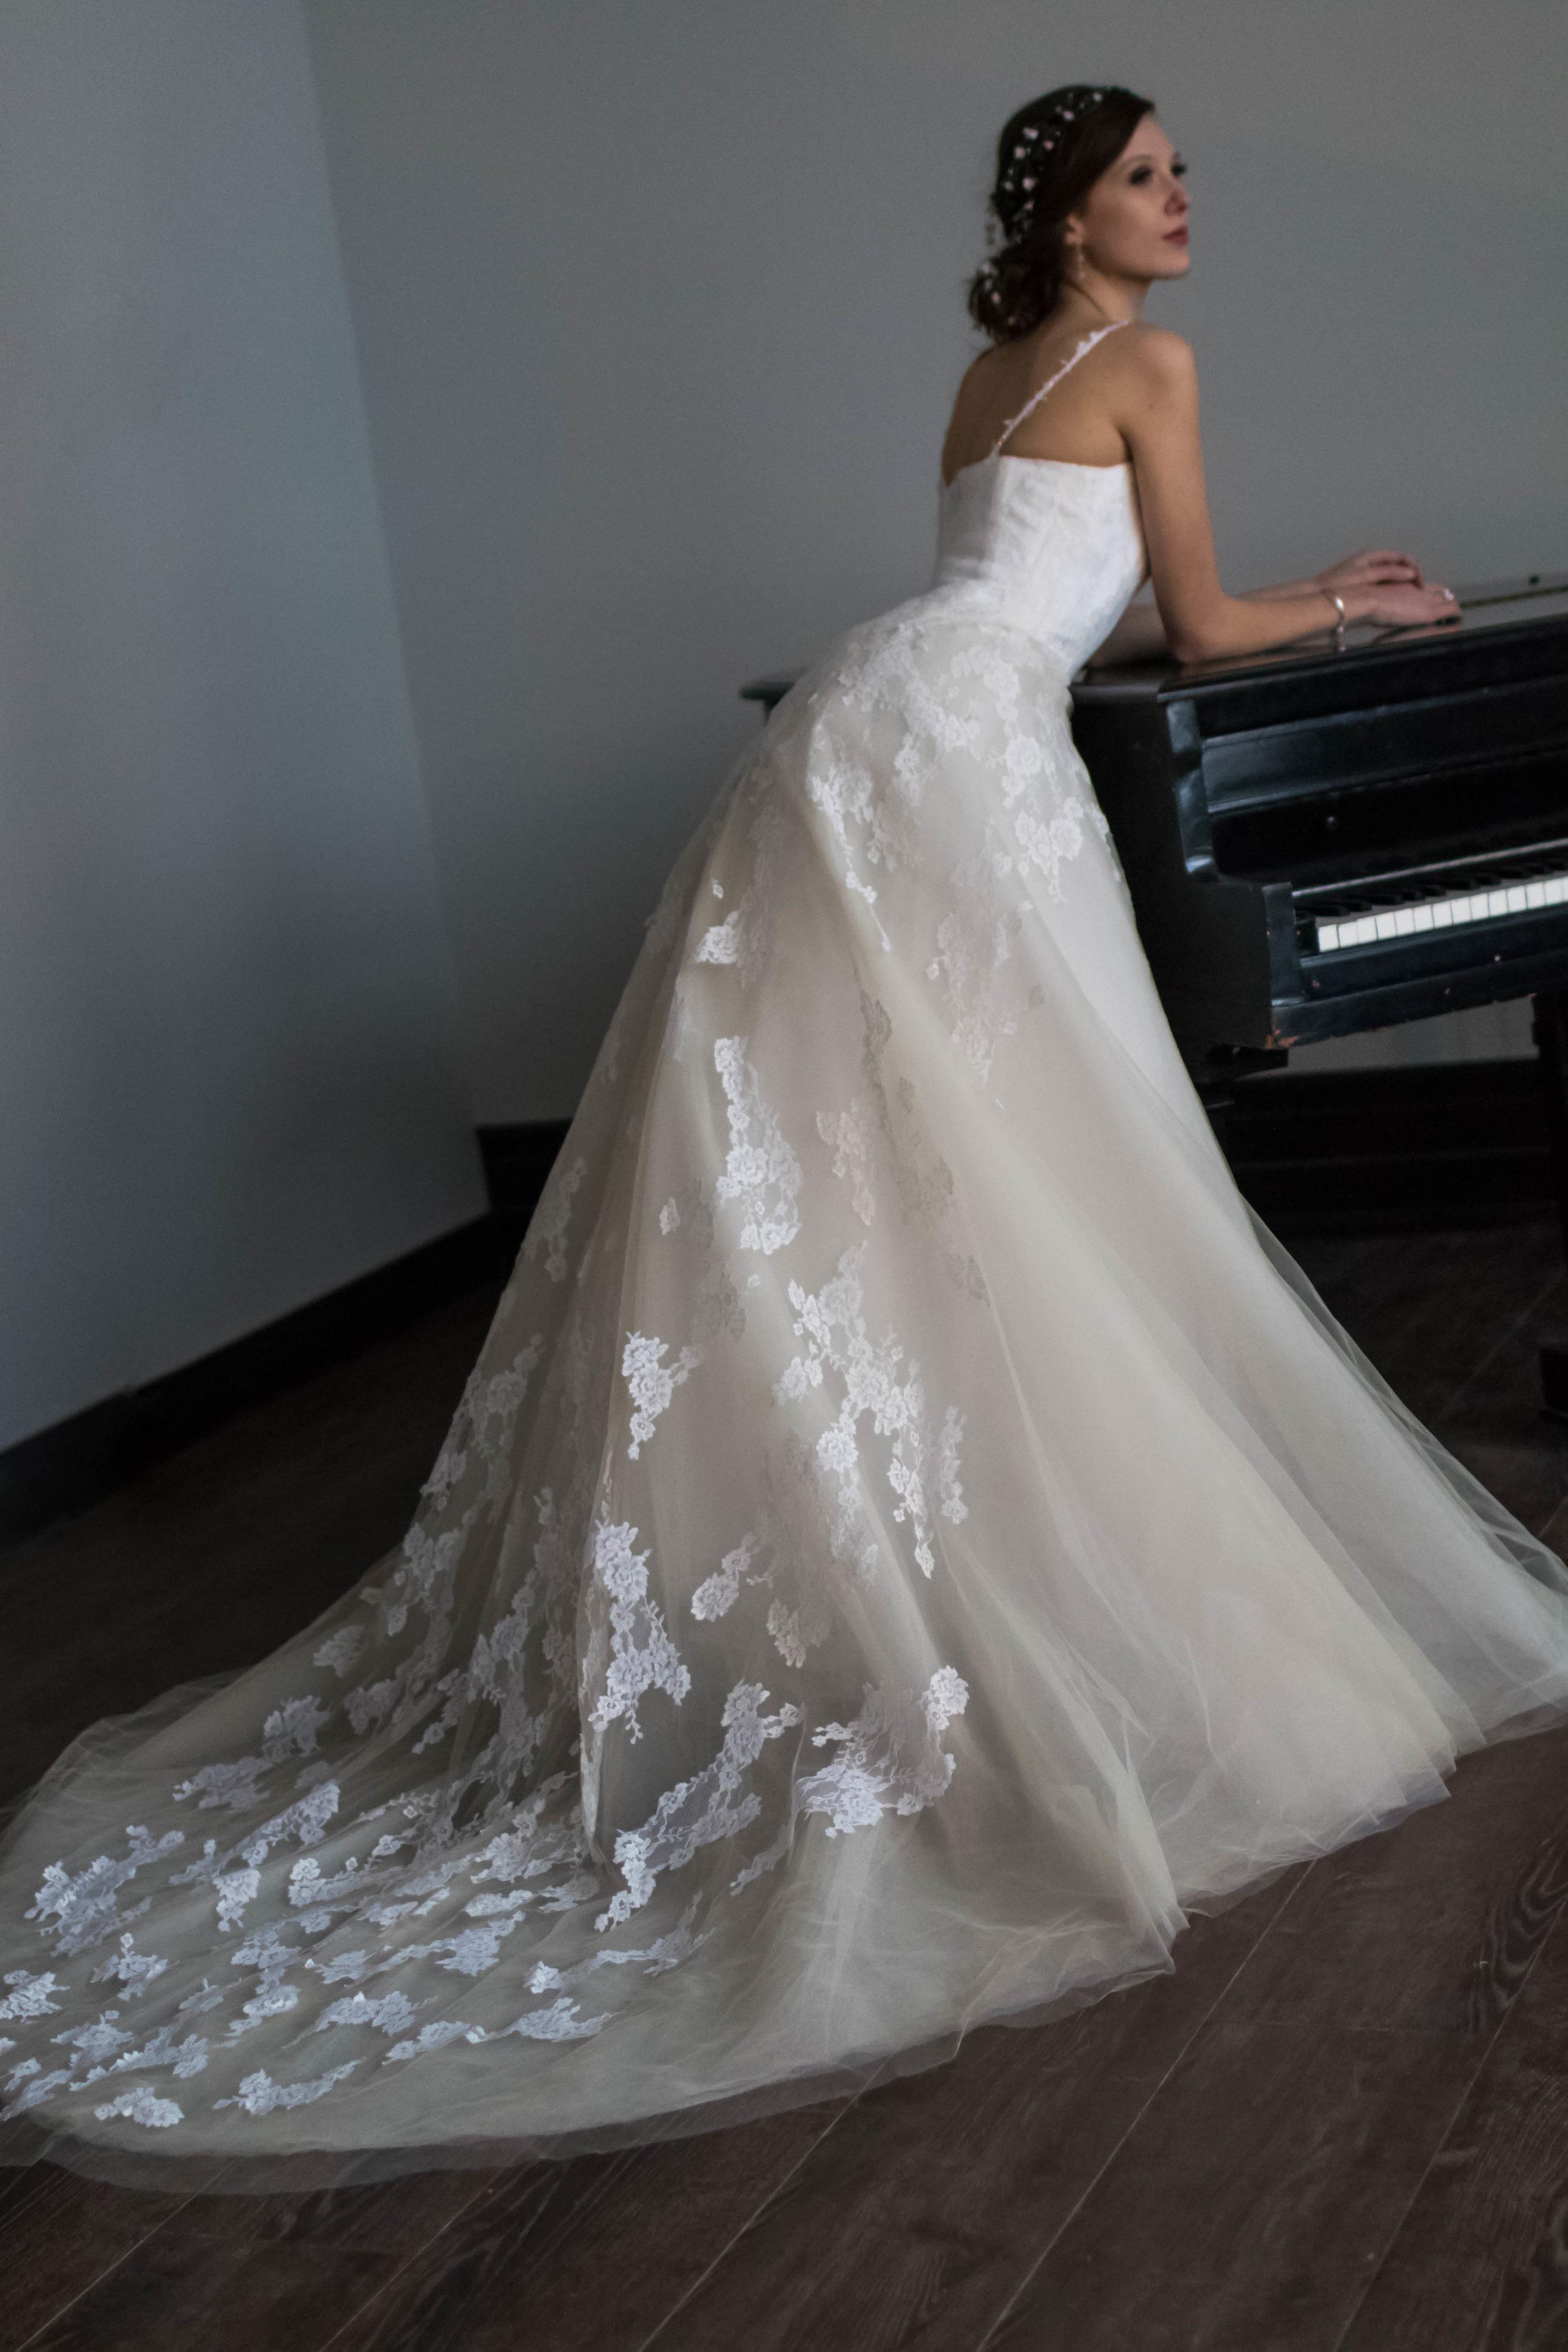 bridal makeup and hairstyle promakeupbynatasha.jpg